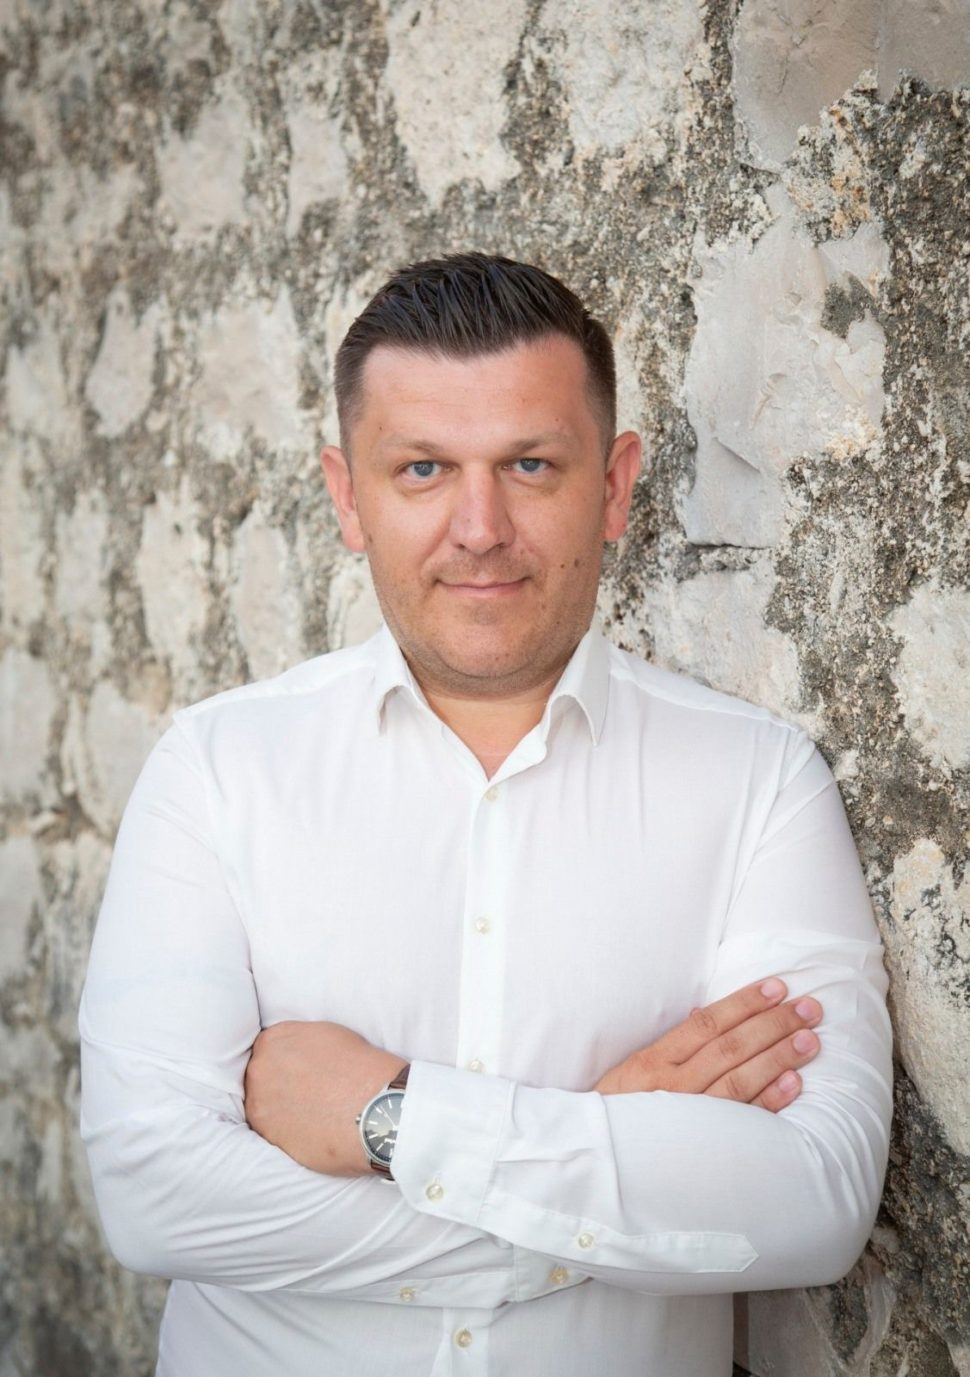 Joship Knezevic